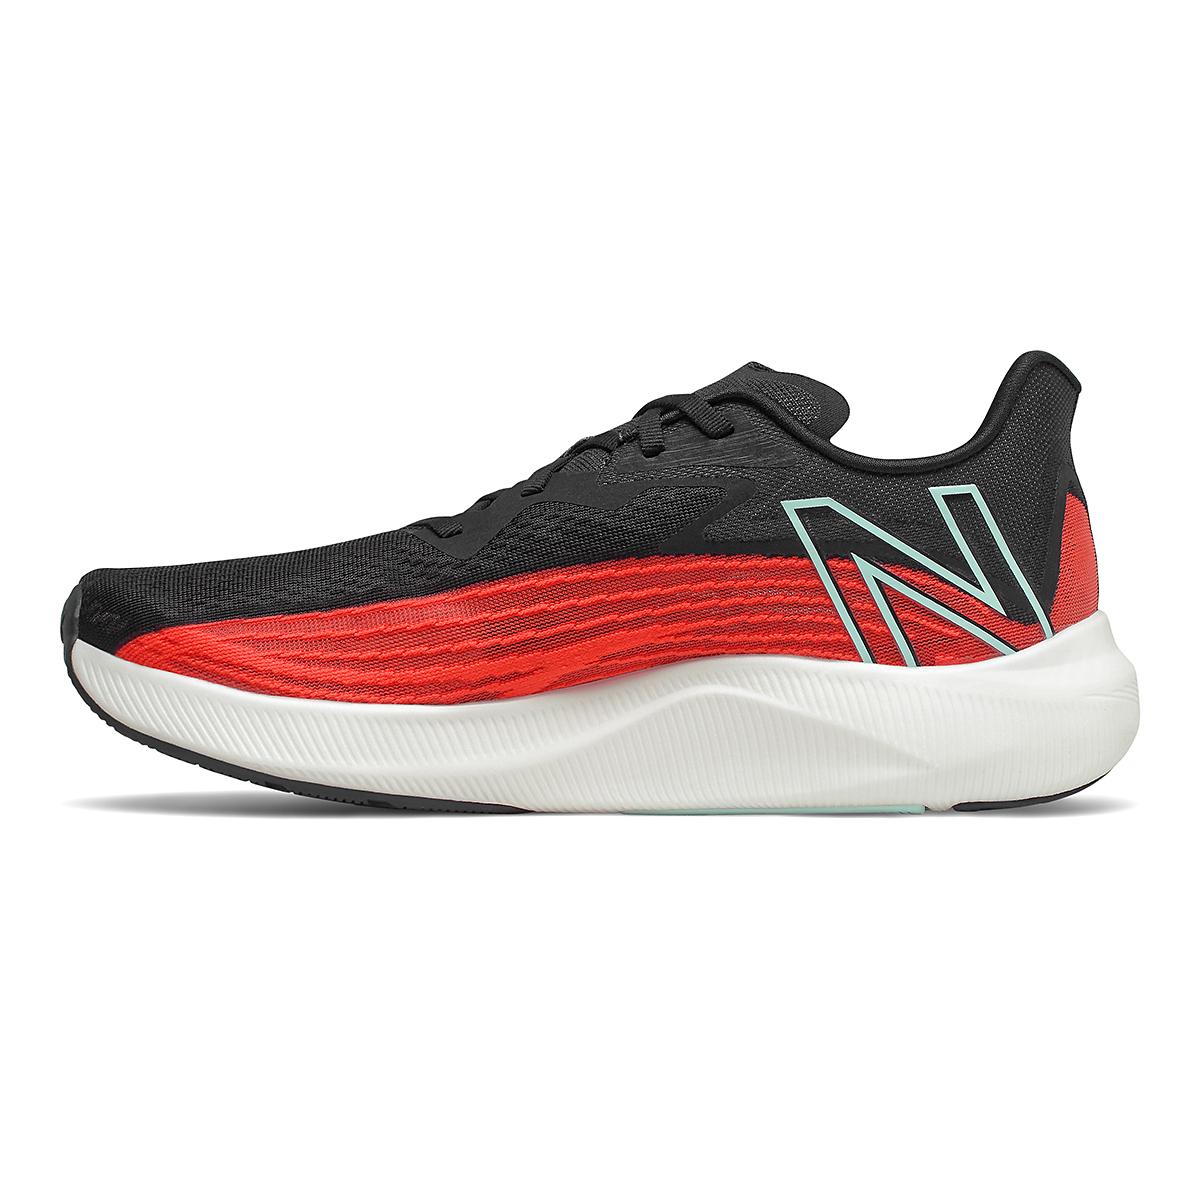 Men's New Balance Fuelcell Rebel V2 Running Shoe - Color: Ghost Pepper/White/Black - Size: 7 - Width: Wide, Ghost Pepper/White/Black, large, image 2